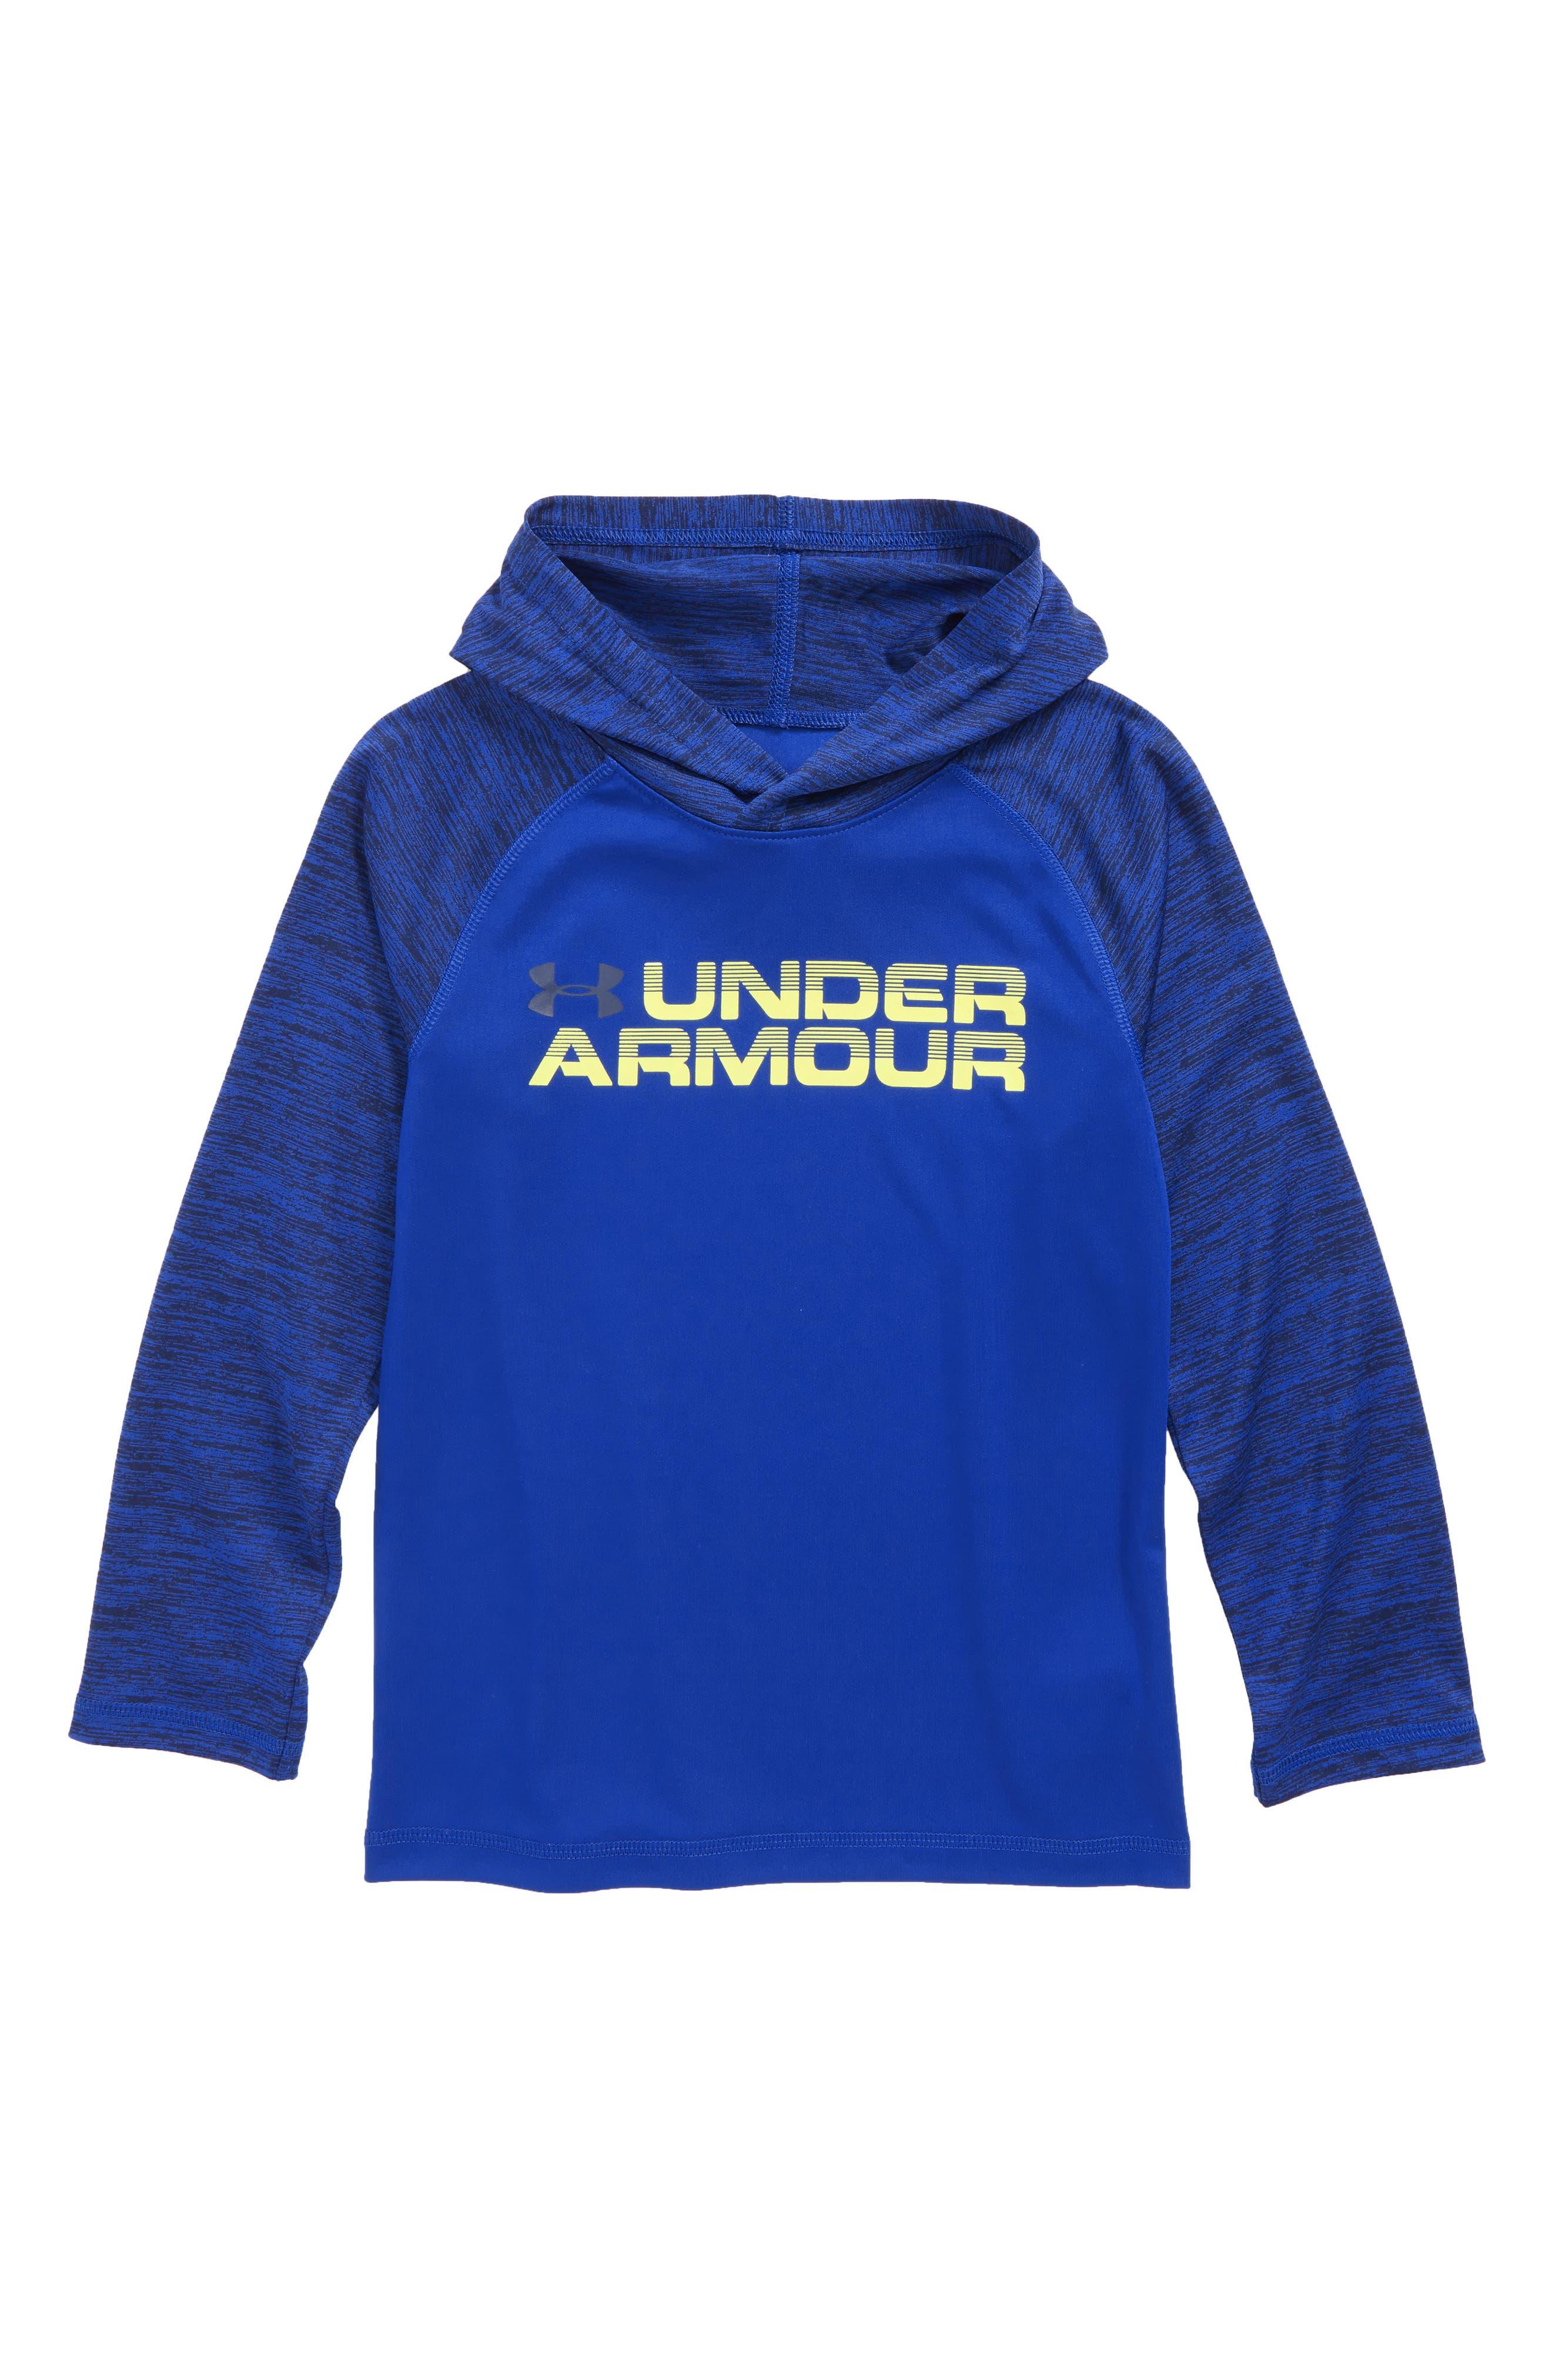 Main Image - Under Armour Wordmark Hooded T-Shirt (Toddler Boys & Little Boys)